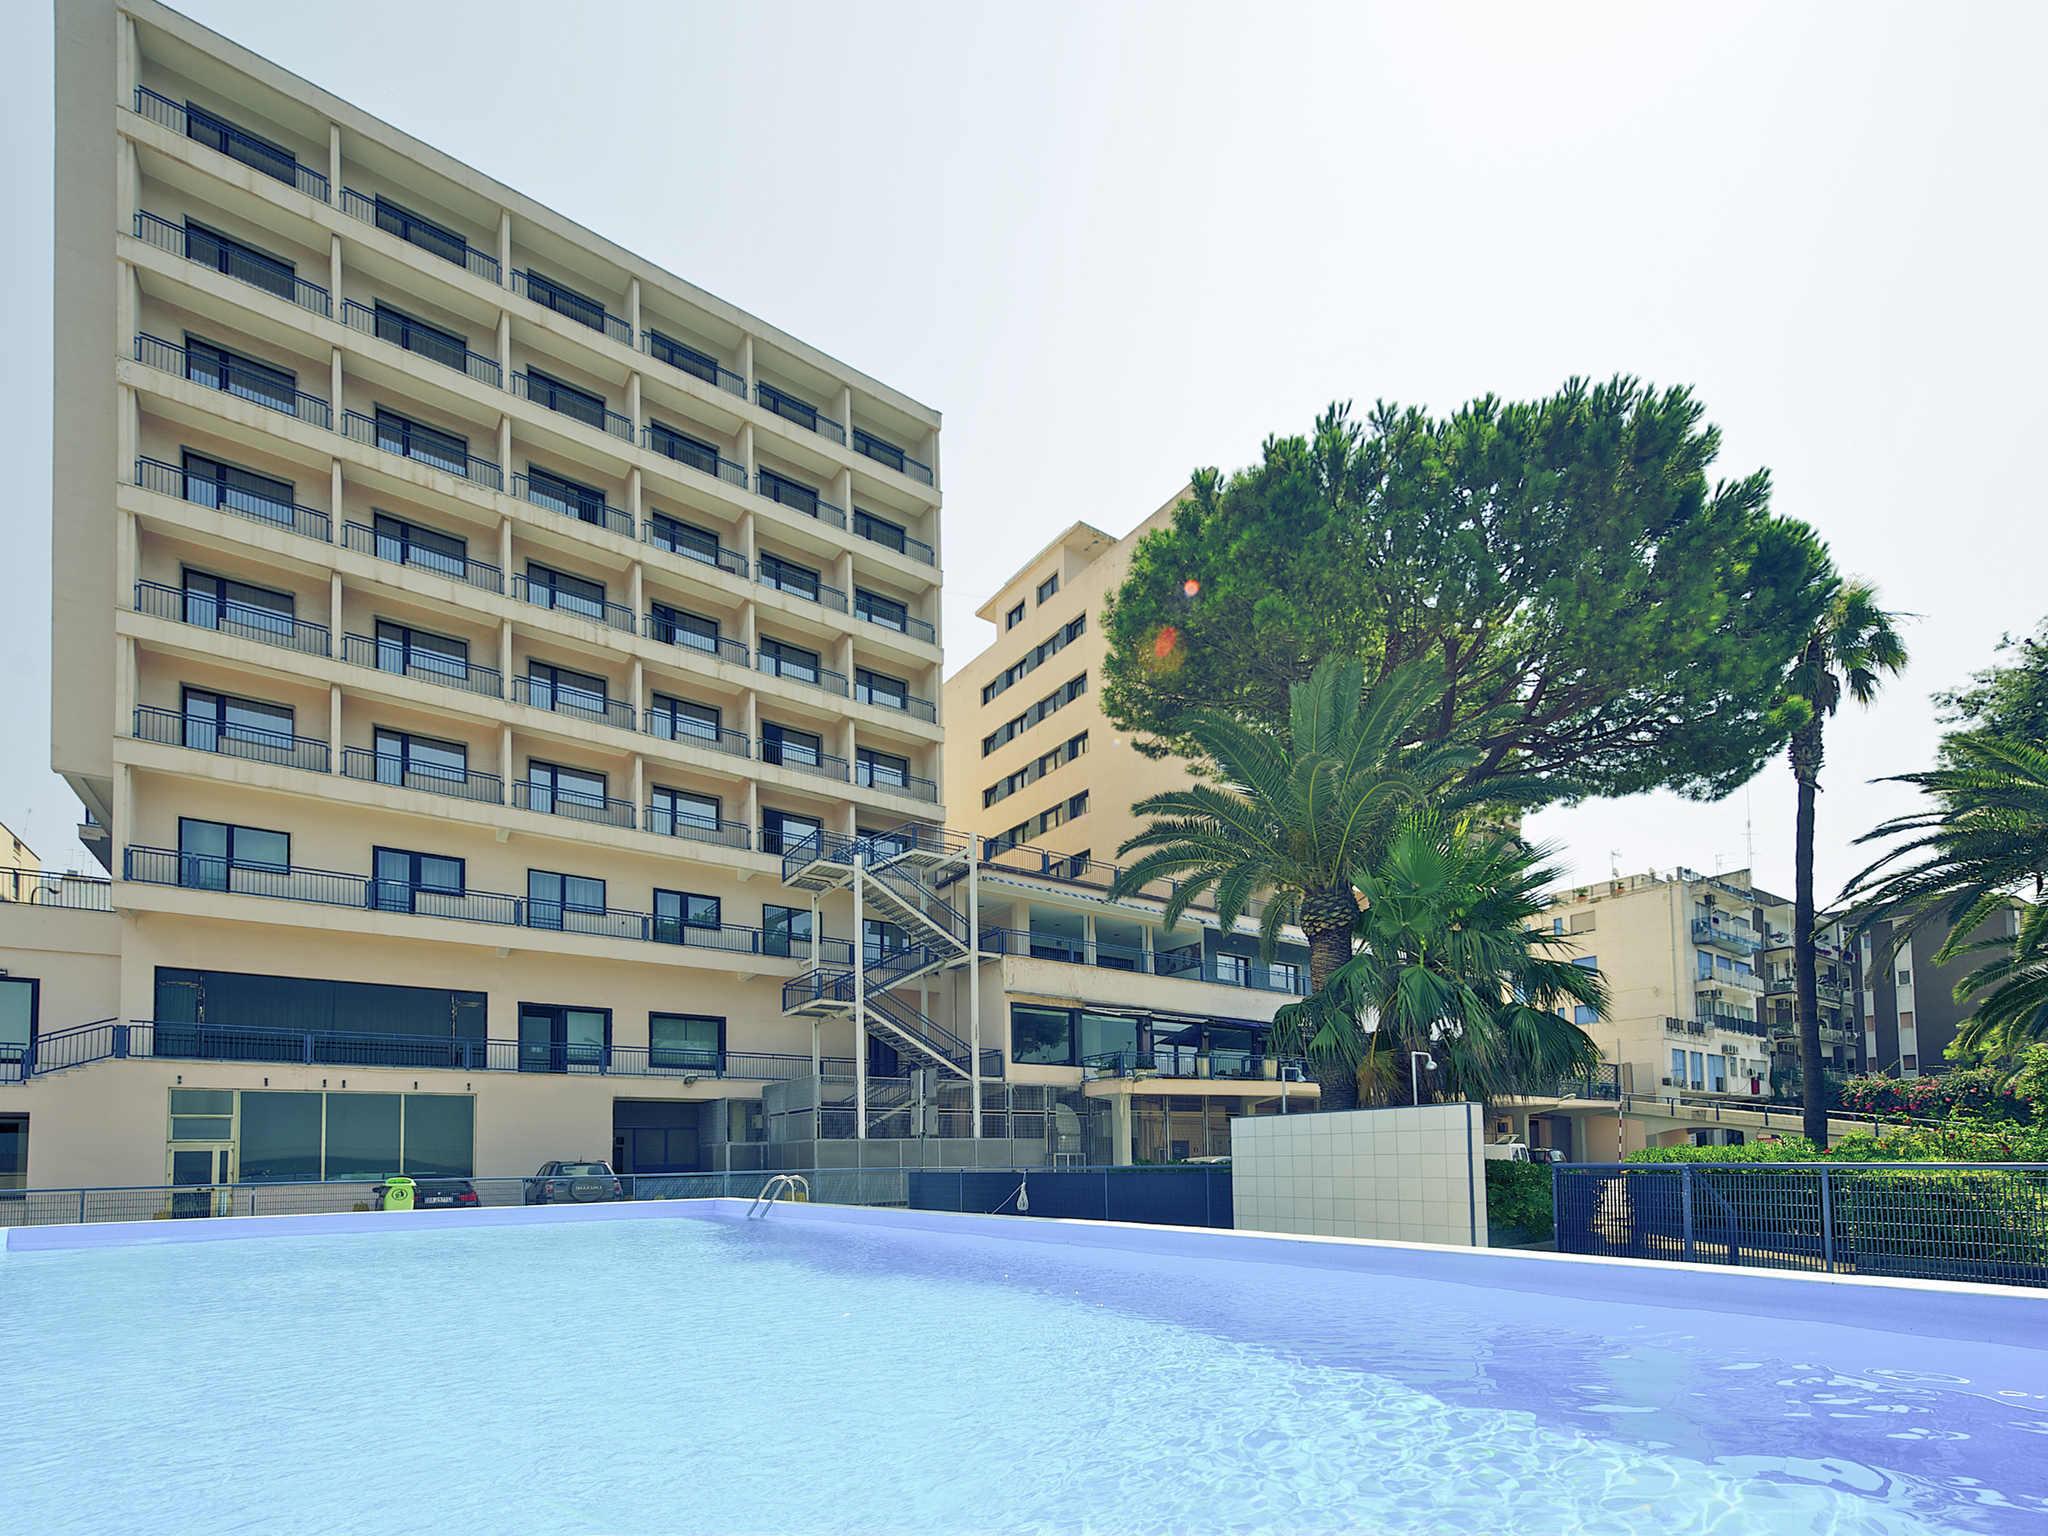 Hotel – Mercure Delfino Taranto